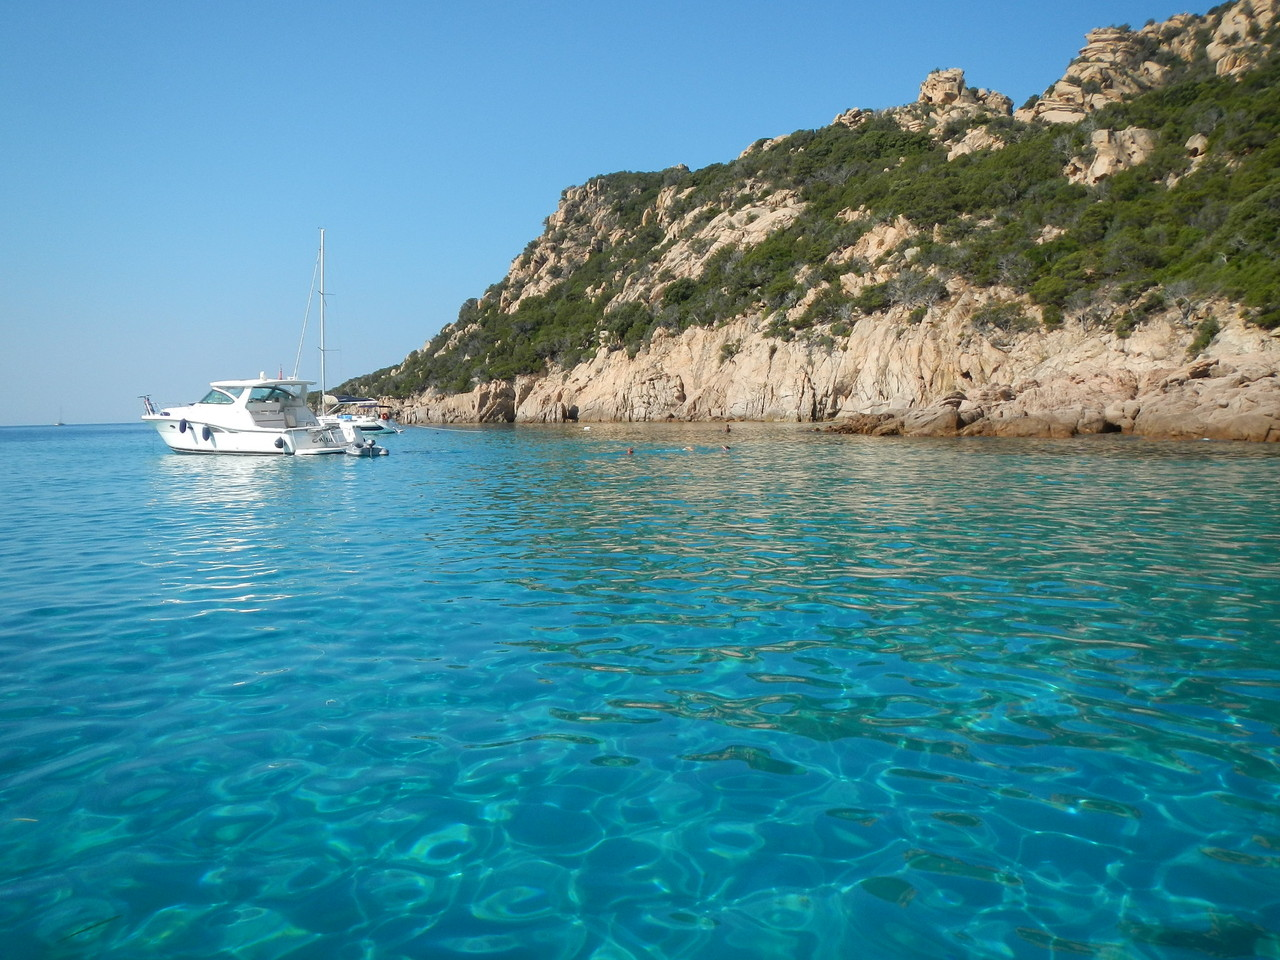 Anse de Roccapina, bei Ost-Wind segeln wir zu diesem Ankerplatz